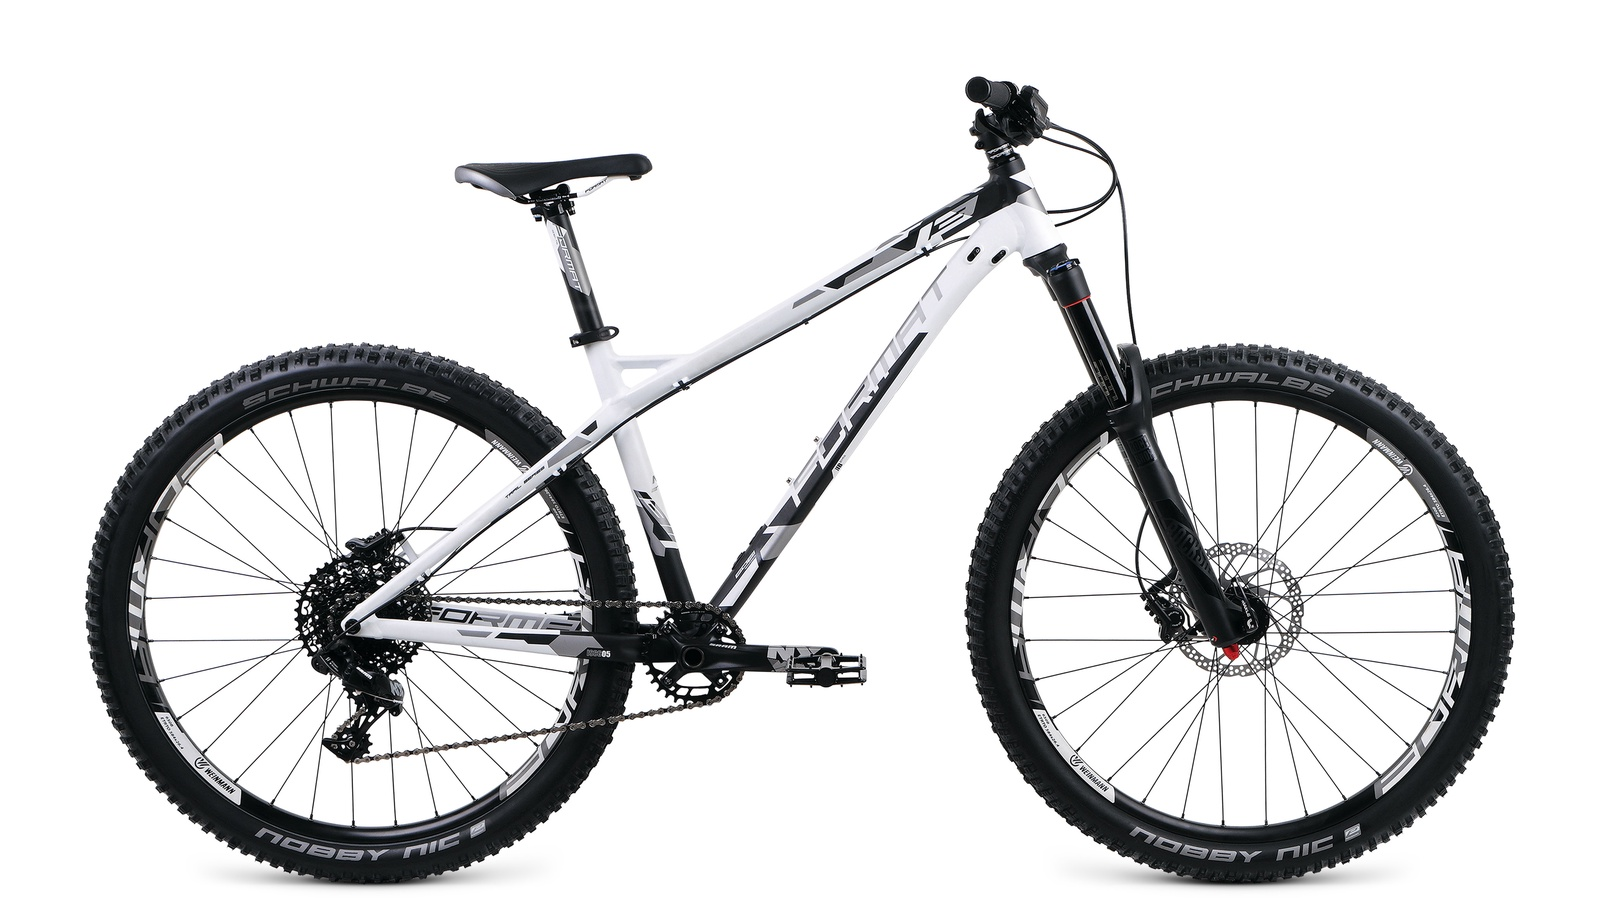 цена на Велосипед Format RBKM8T67E002, черный